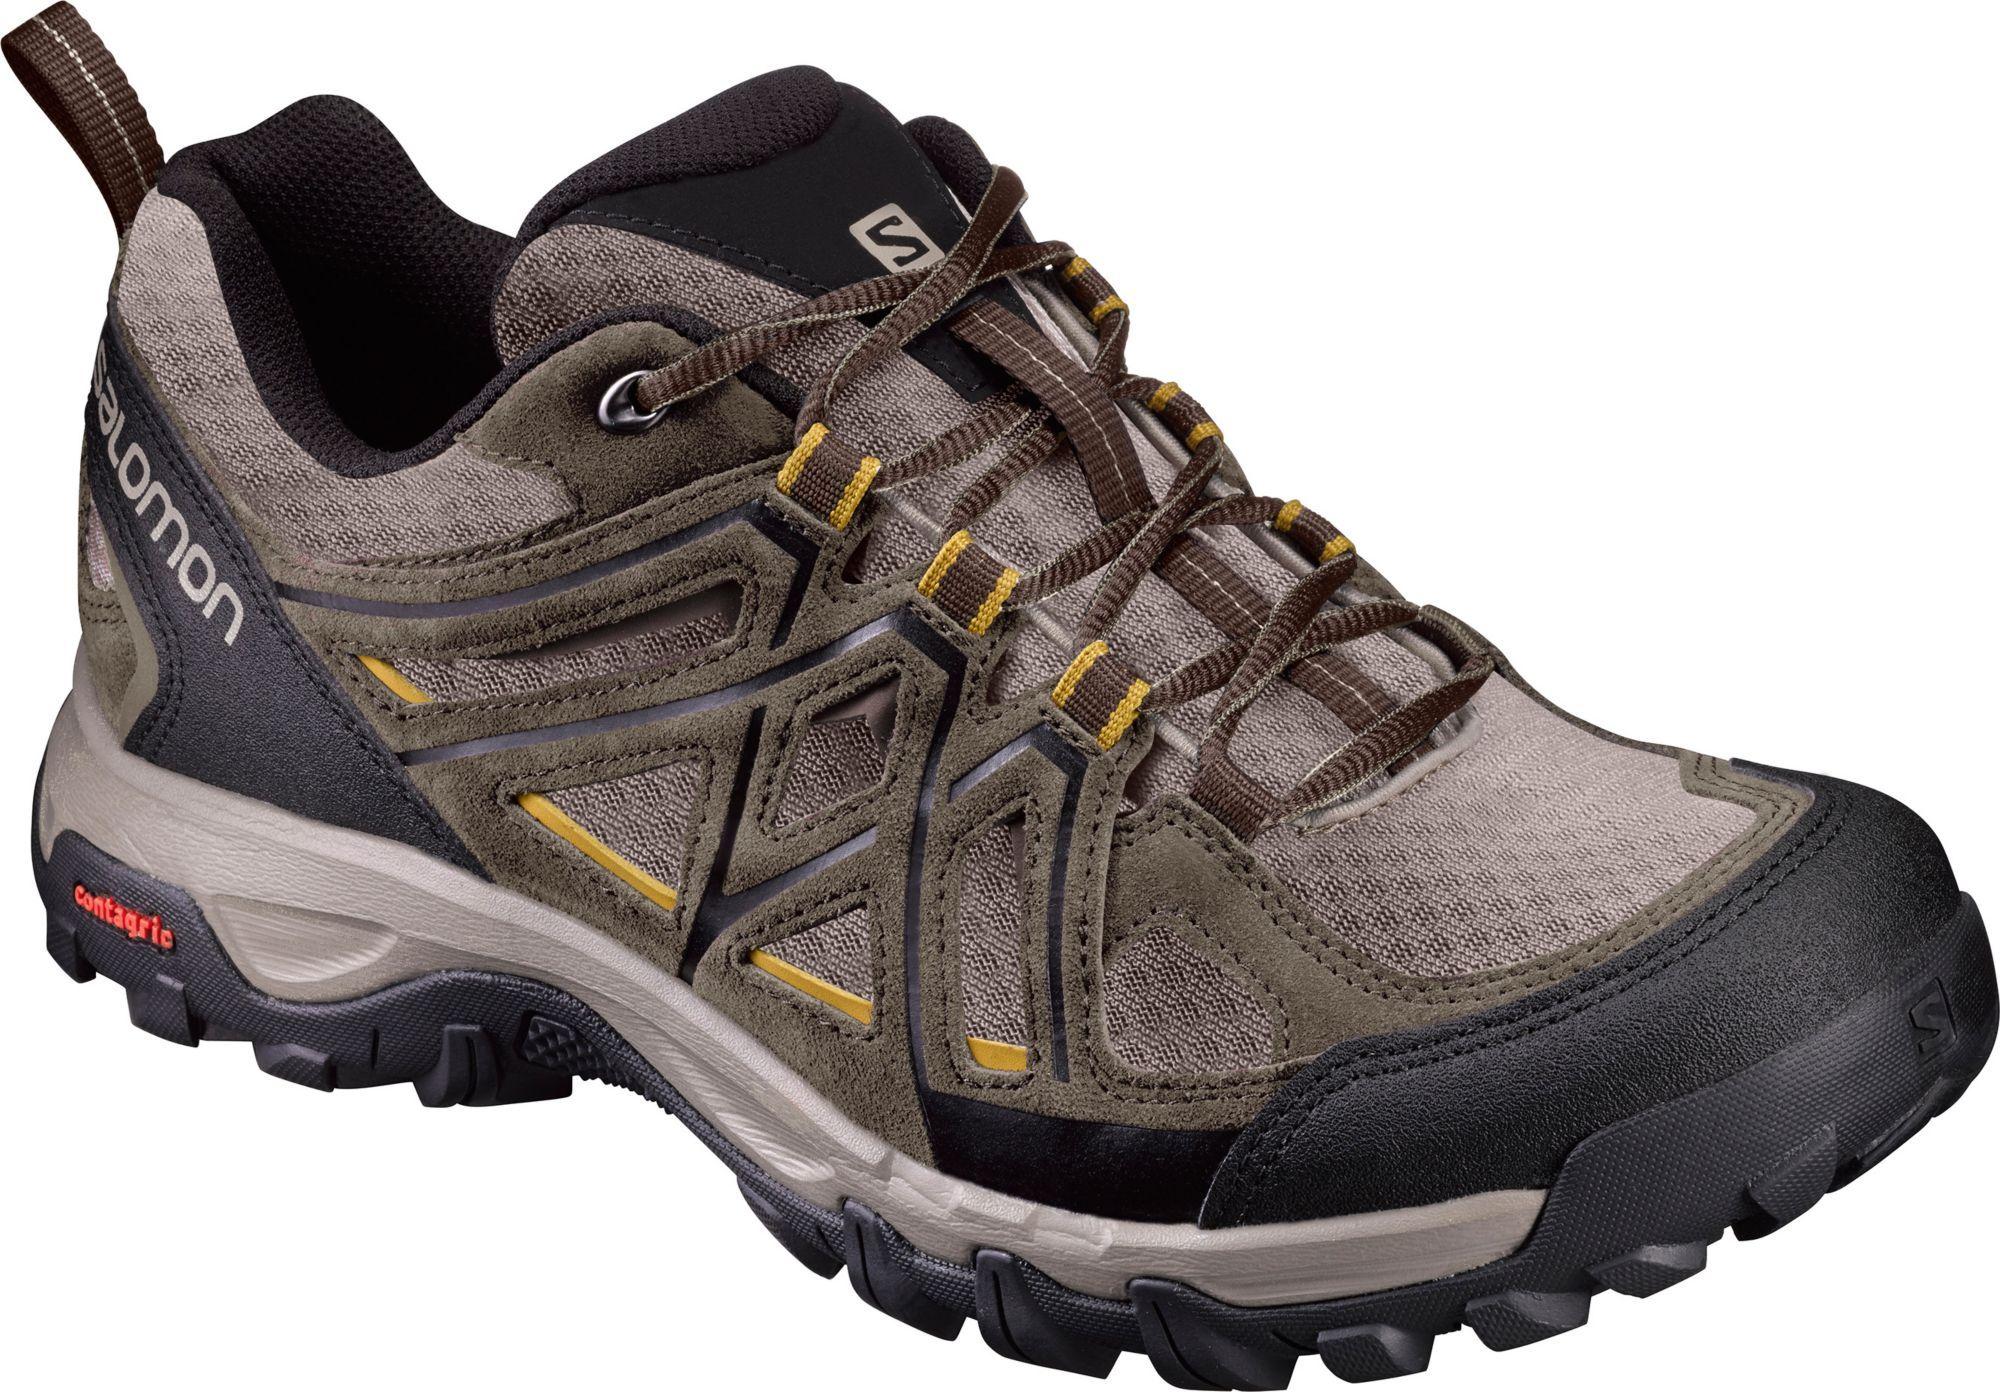 Salomon Men's Evasion 2 Aero Hiking Shoes, Size: 11.0, Honey